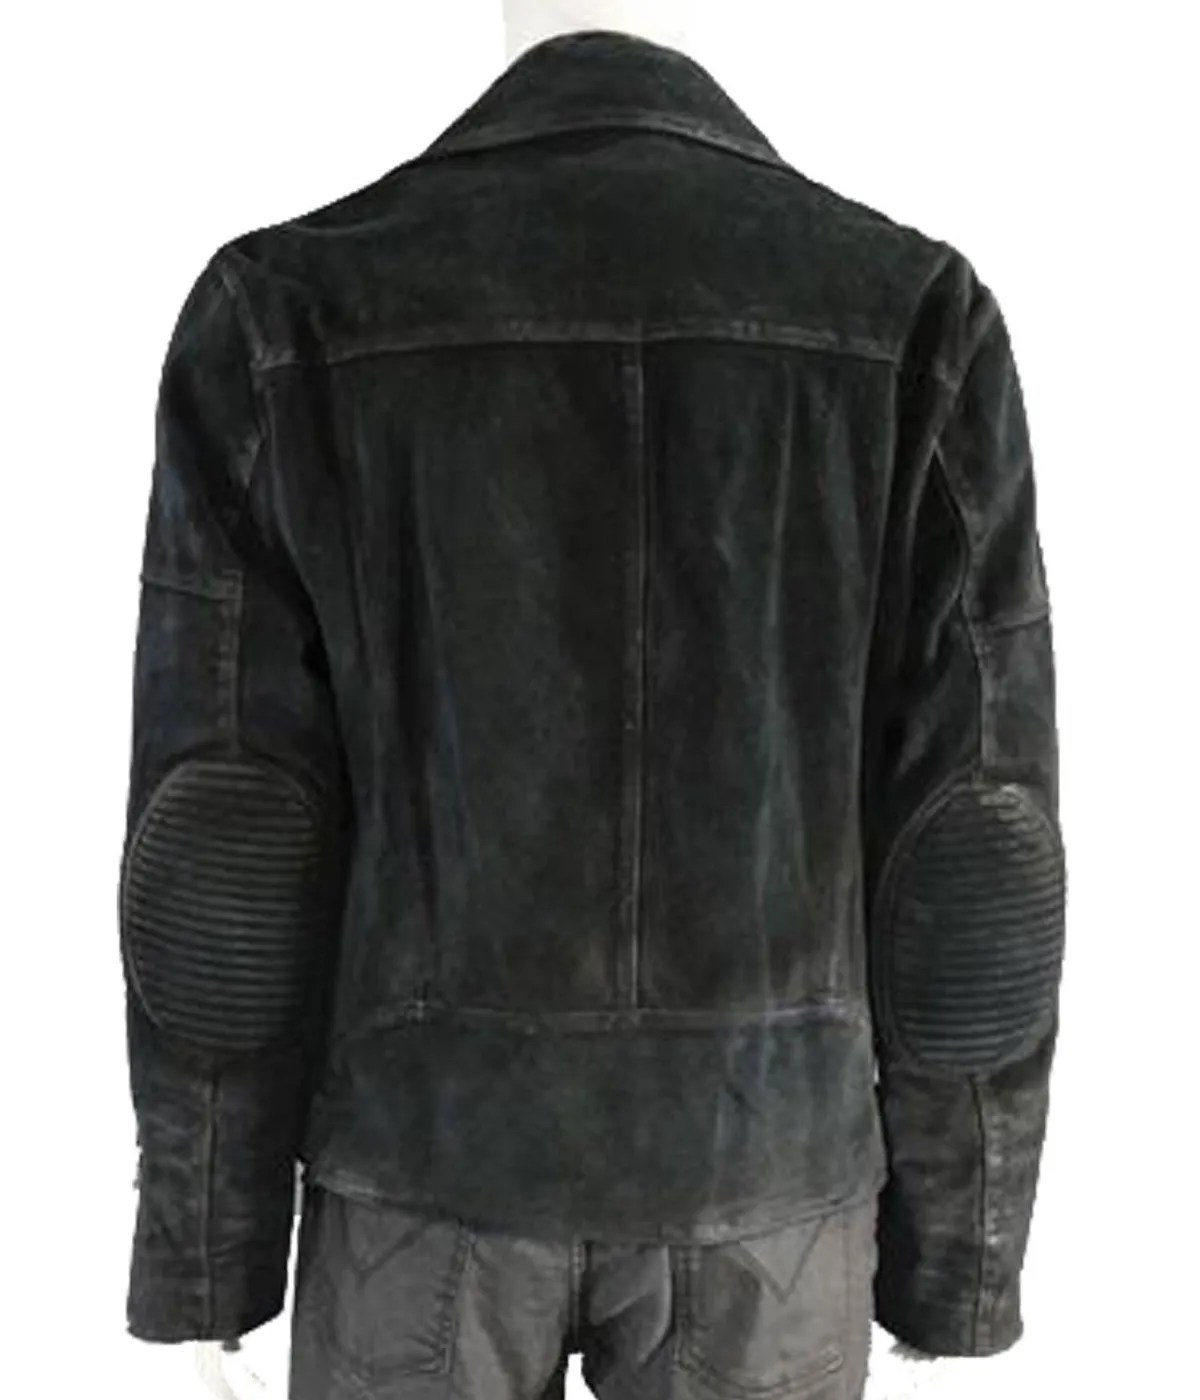 driver-jon-hmm-jacket